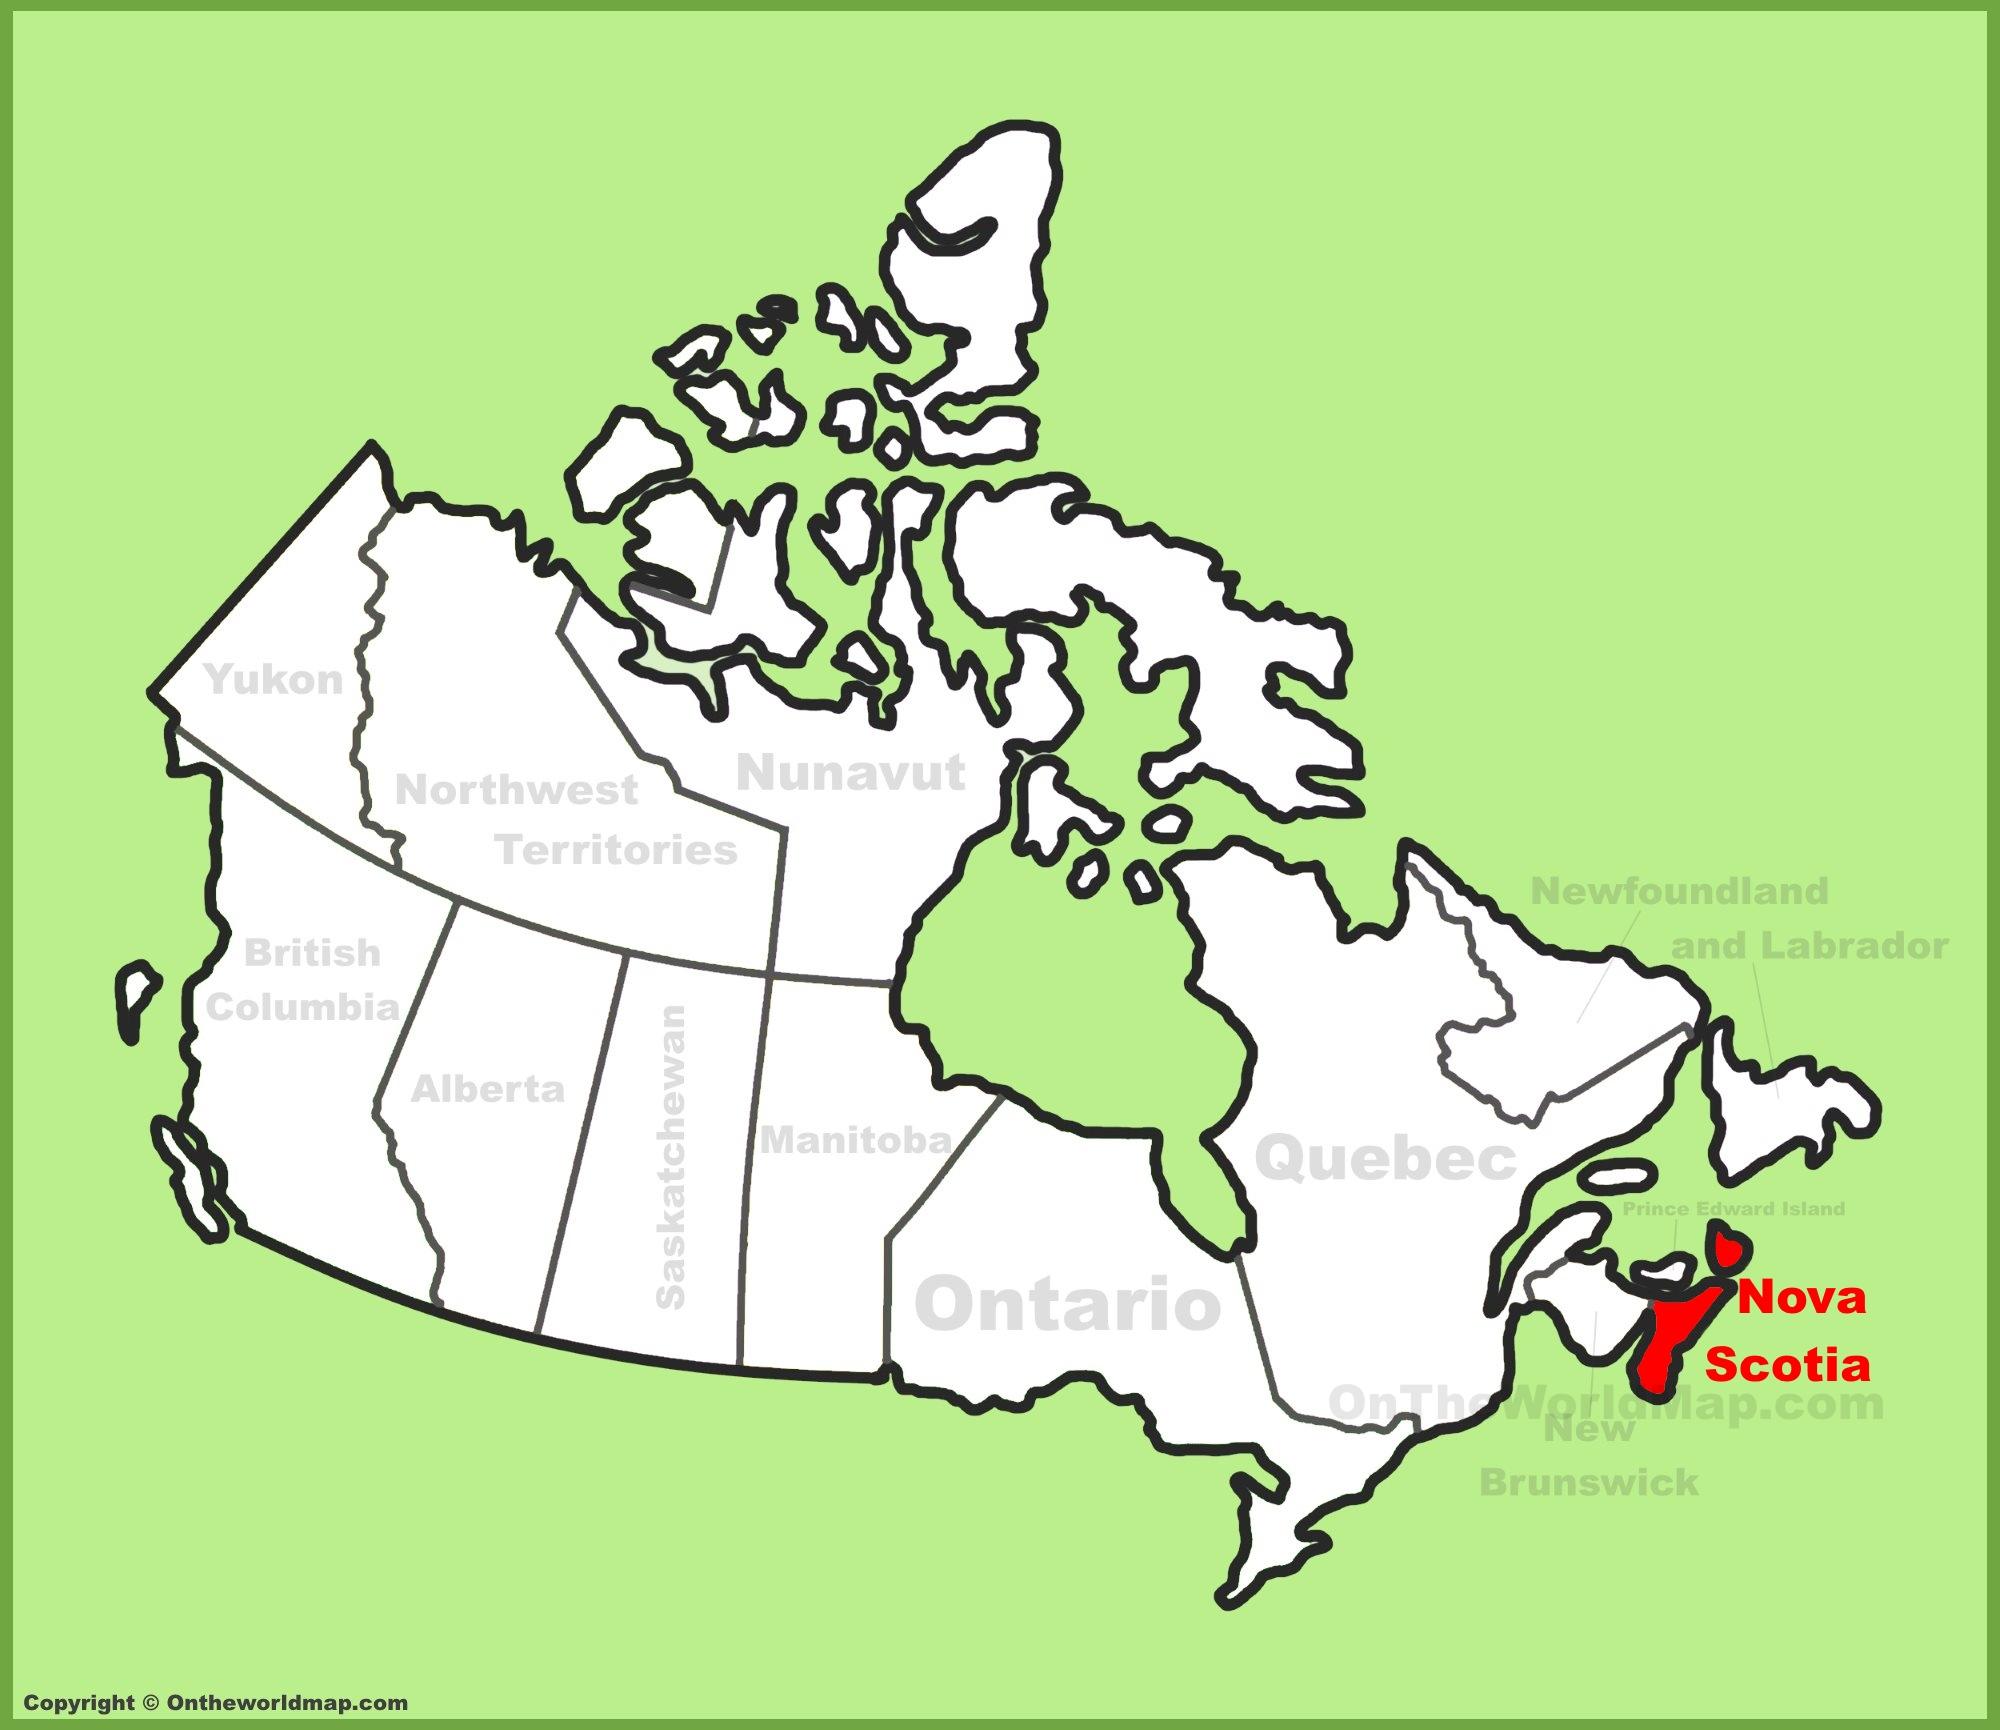 Nova Scotia Maps Canada Maps Of Nova Scotia NS - Nova scotia map